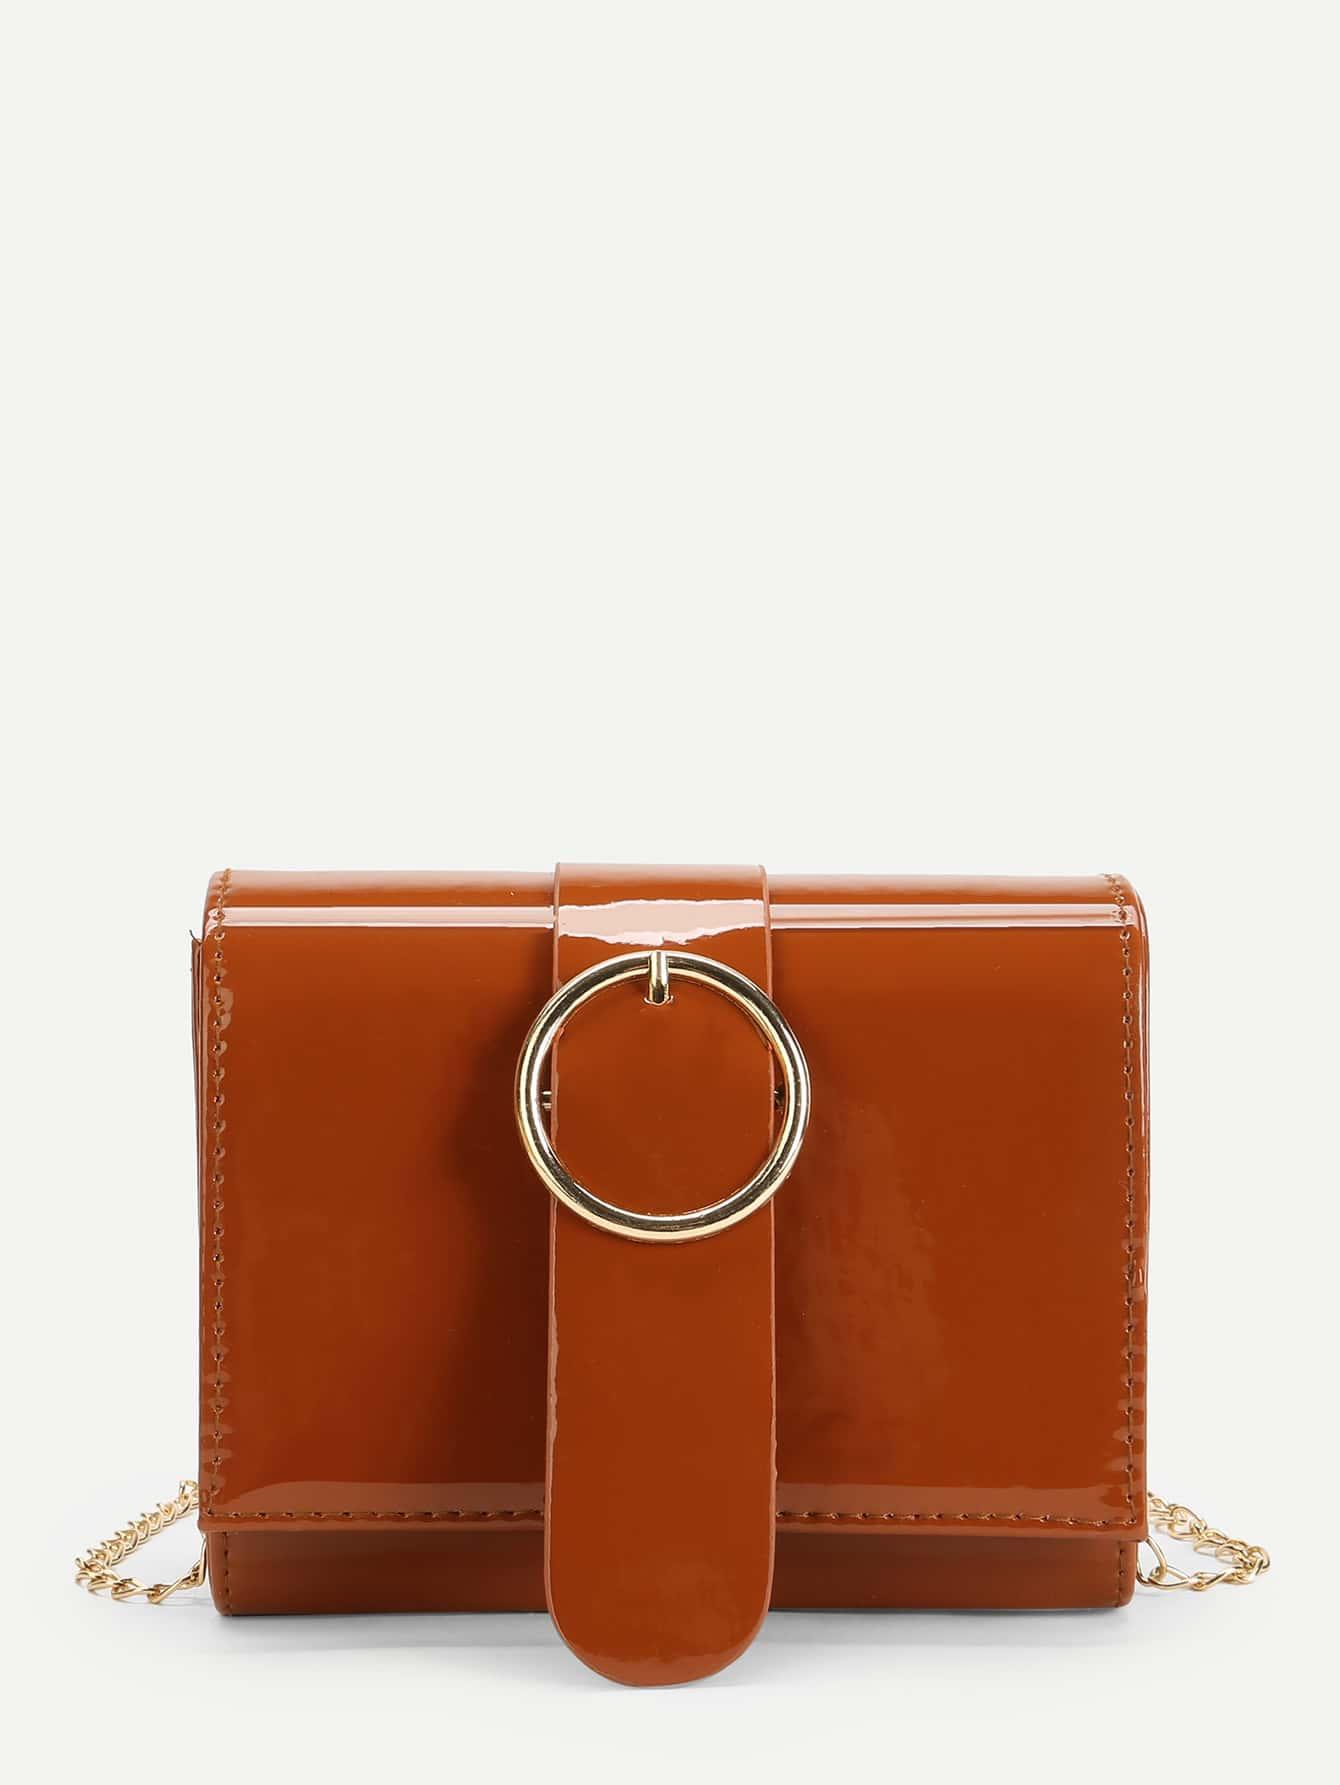 Buckle Decor Patent Leather Shoulder Bag